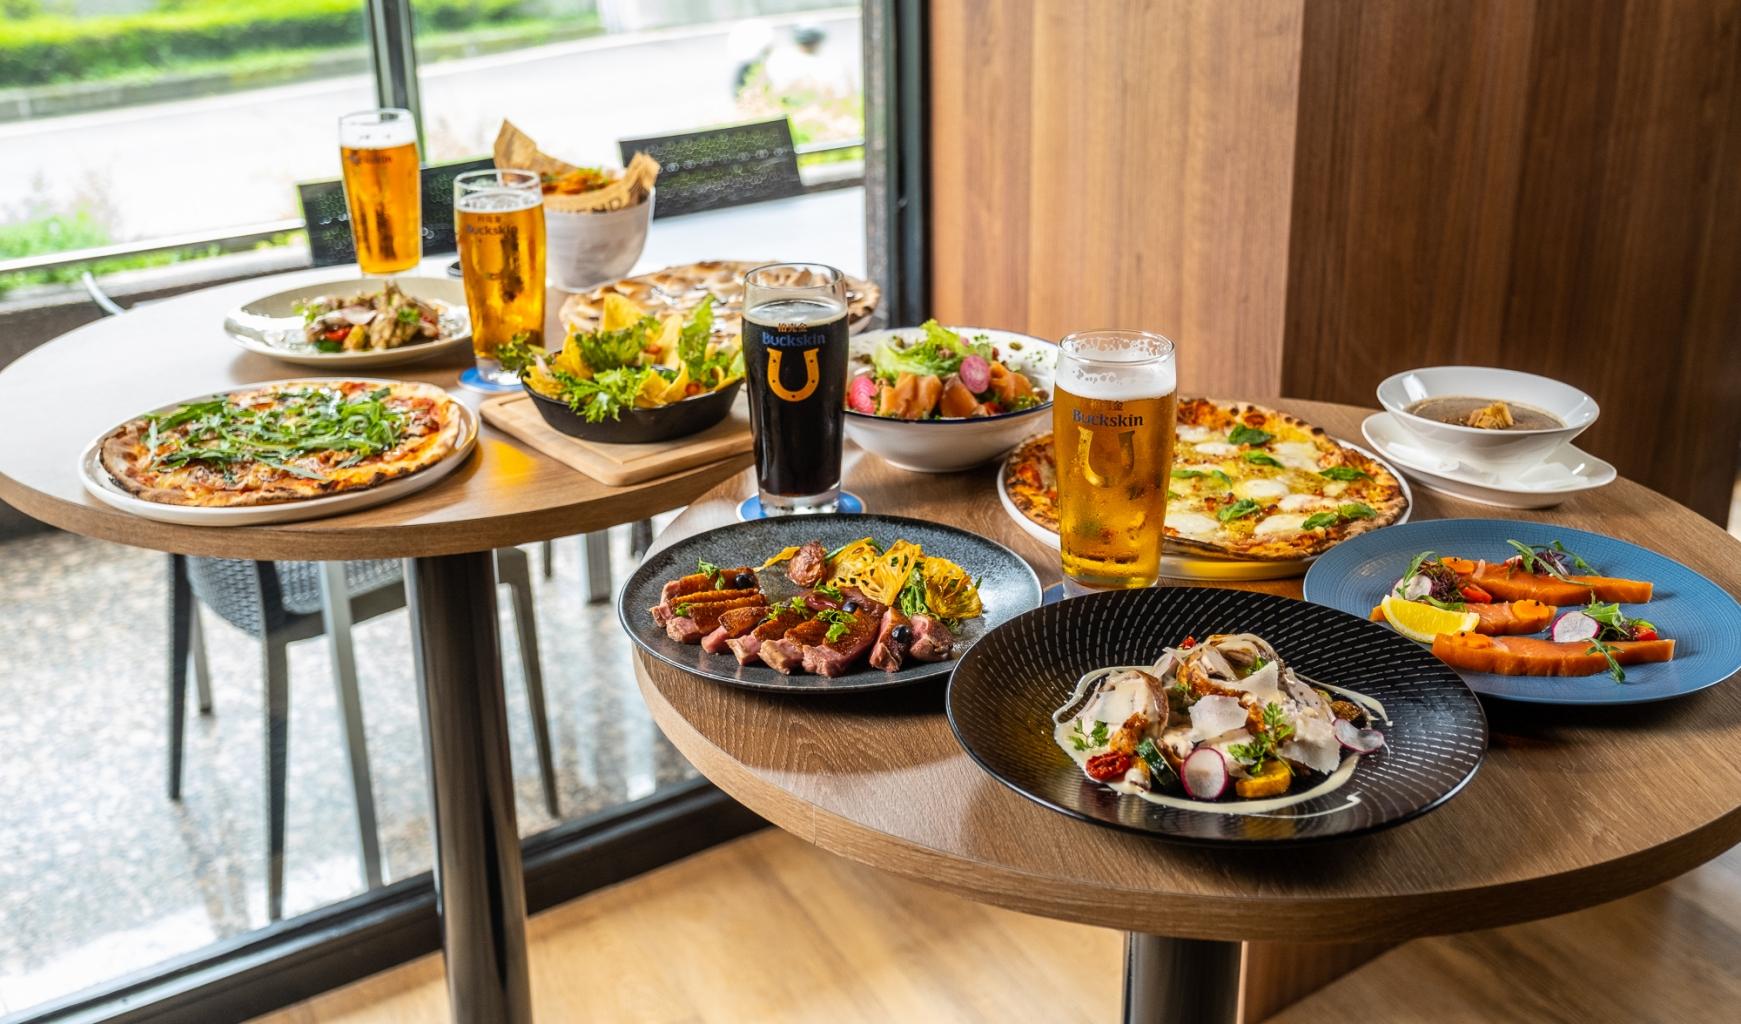 Buckskin Beerhouse南京店將於明(17)日正式開幕,推出多道南京店限定美食